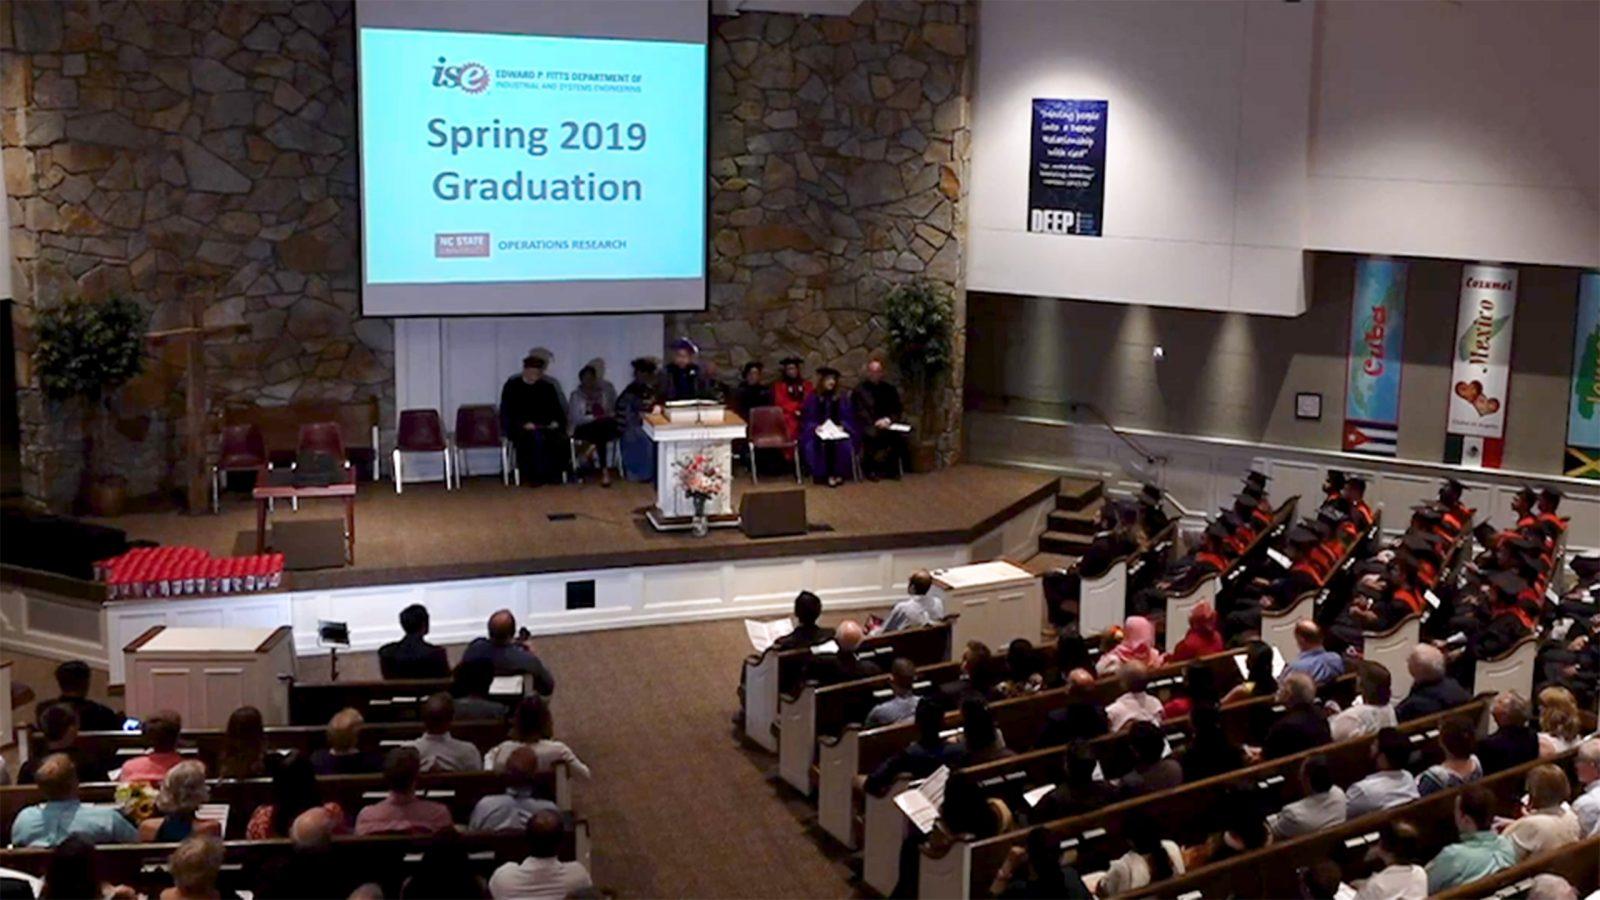 Spring 2019 Graduation Ceremony